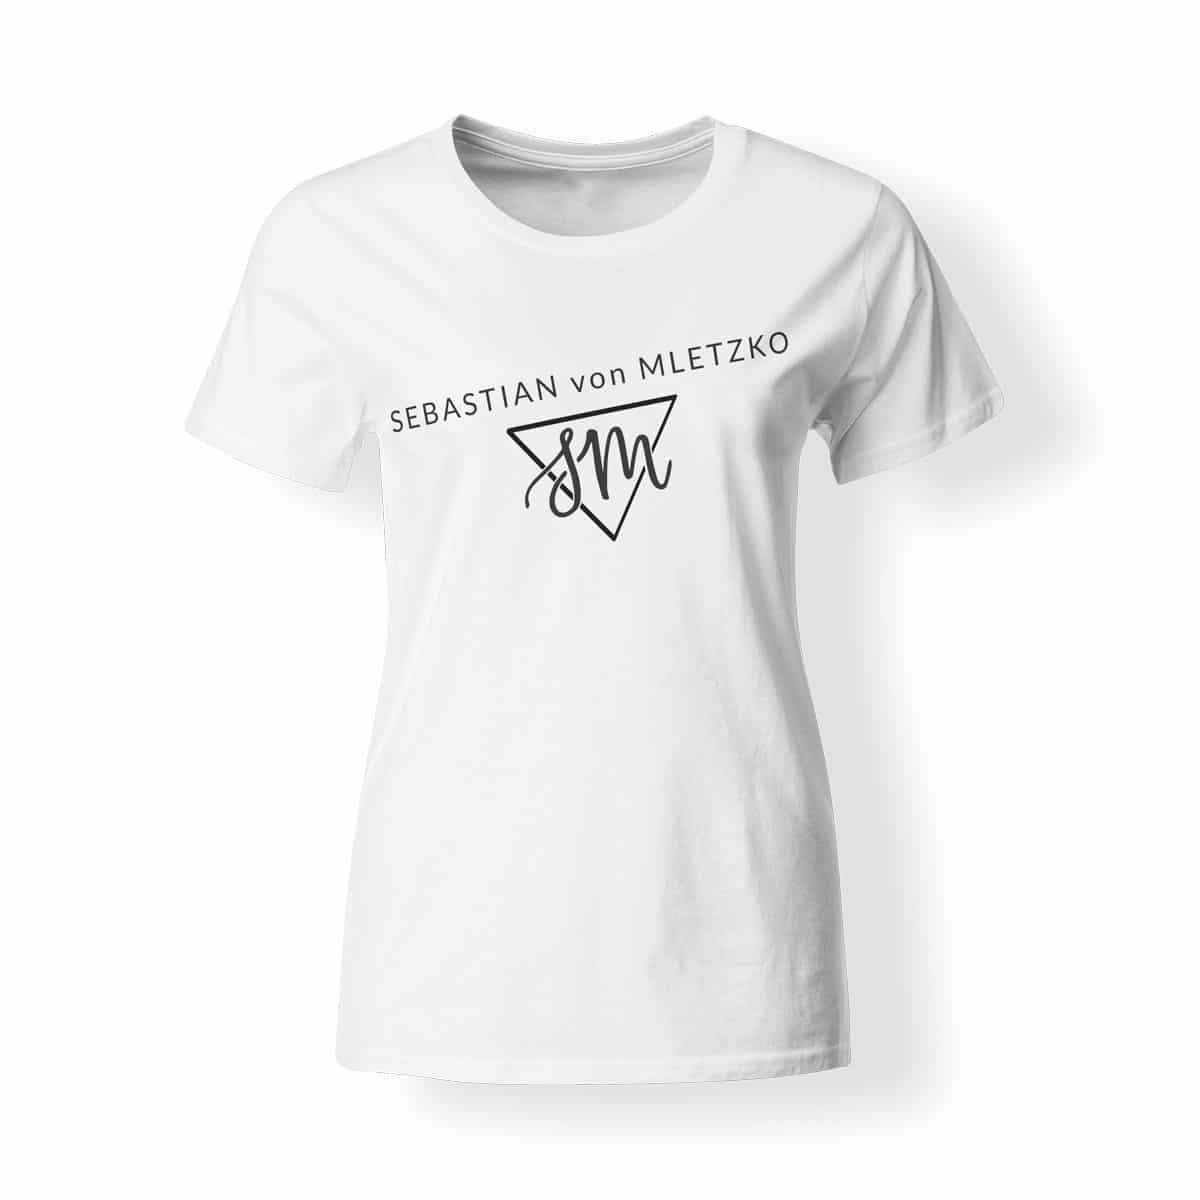 Sebastian von Mletzko T-Shirt Damen weiss